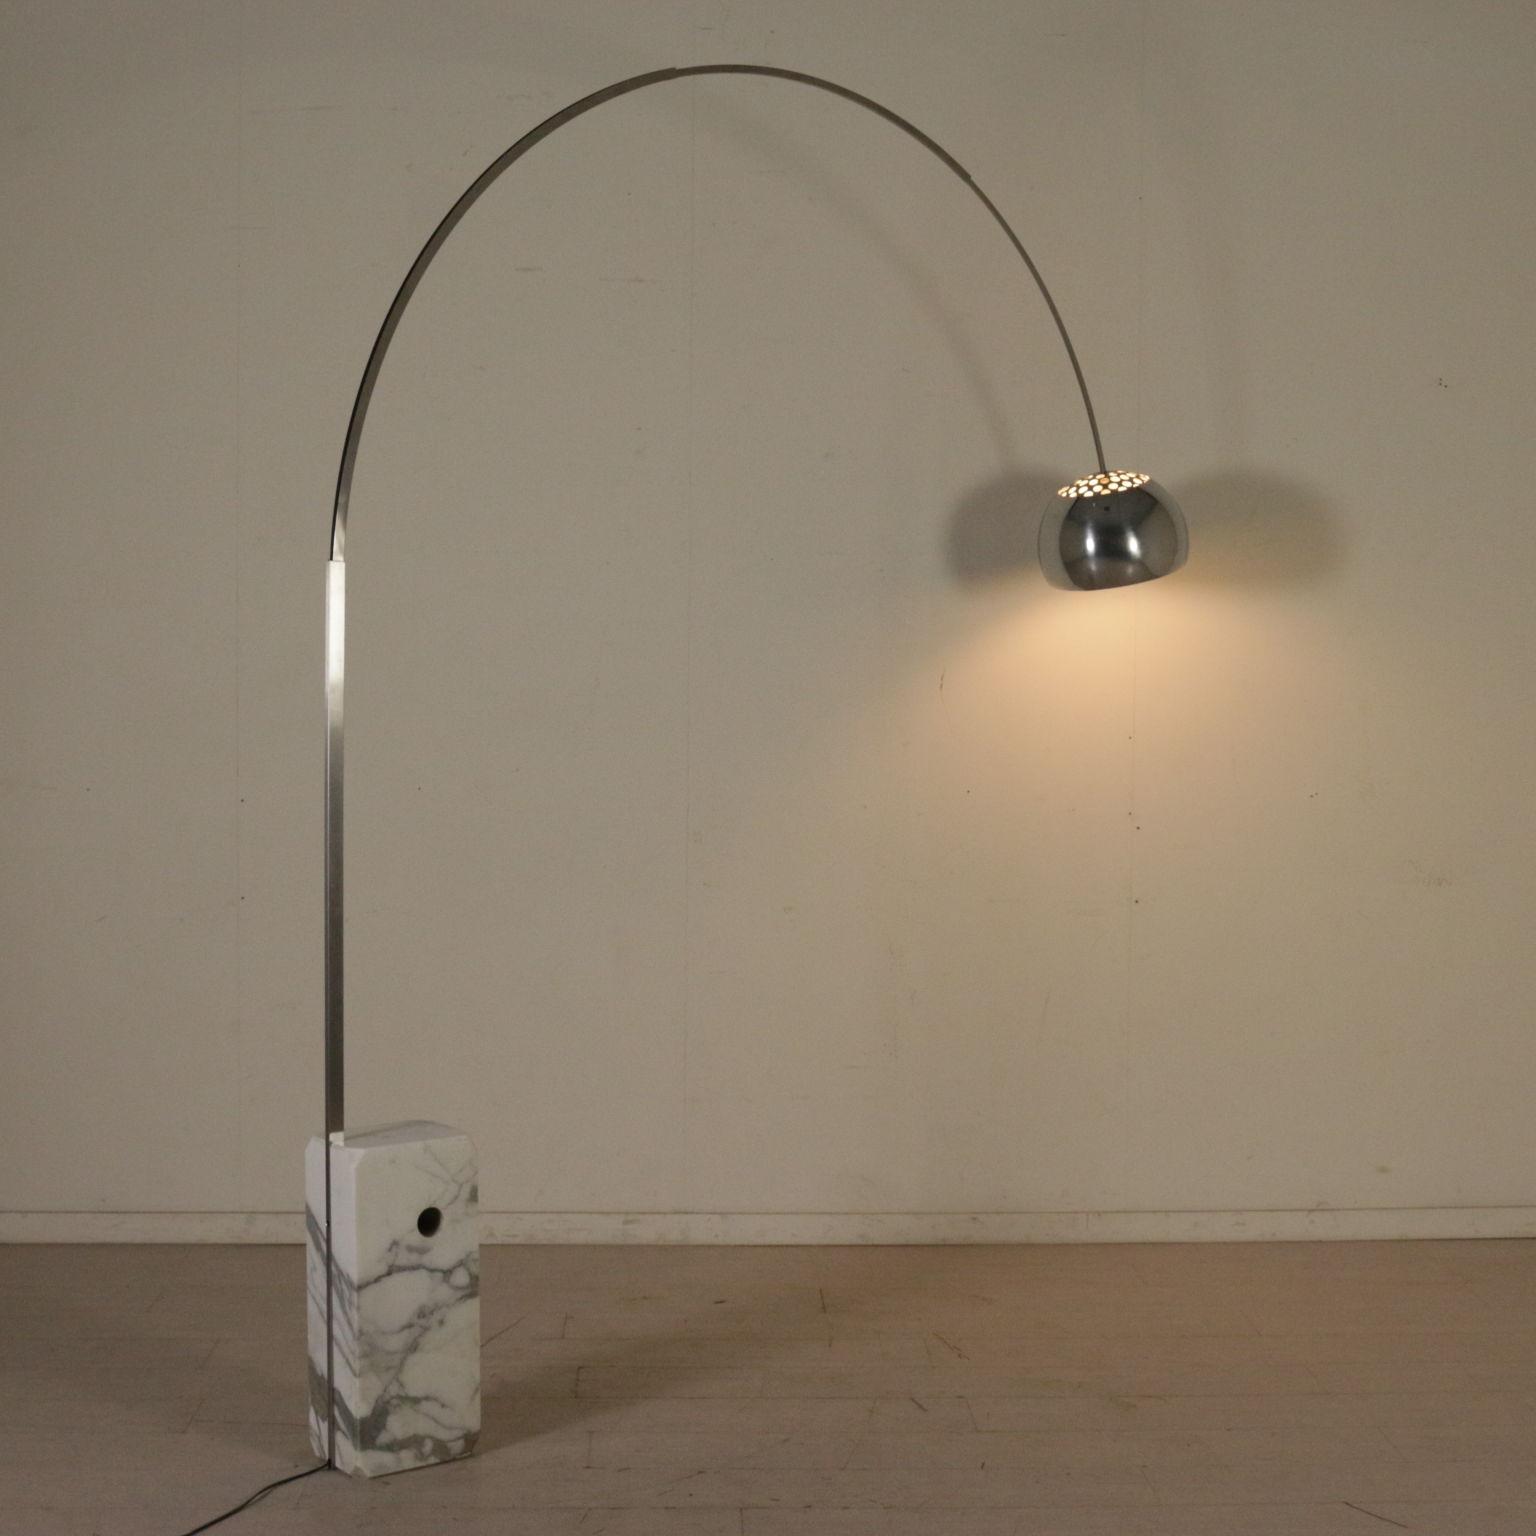 arco lighting. Arco Lighting. Lamp Lighting N L